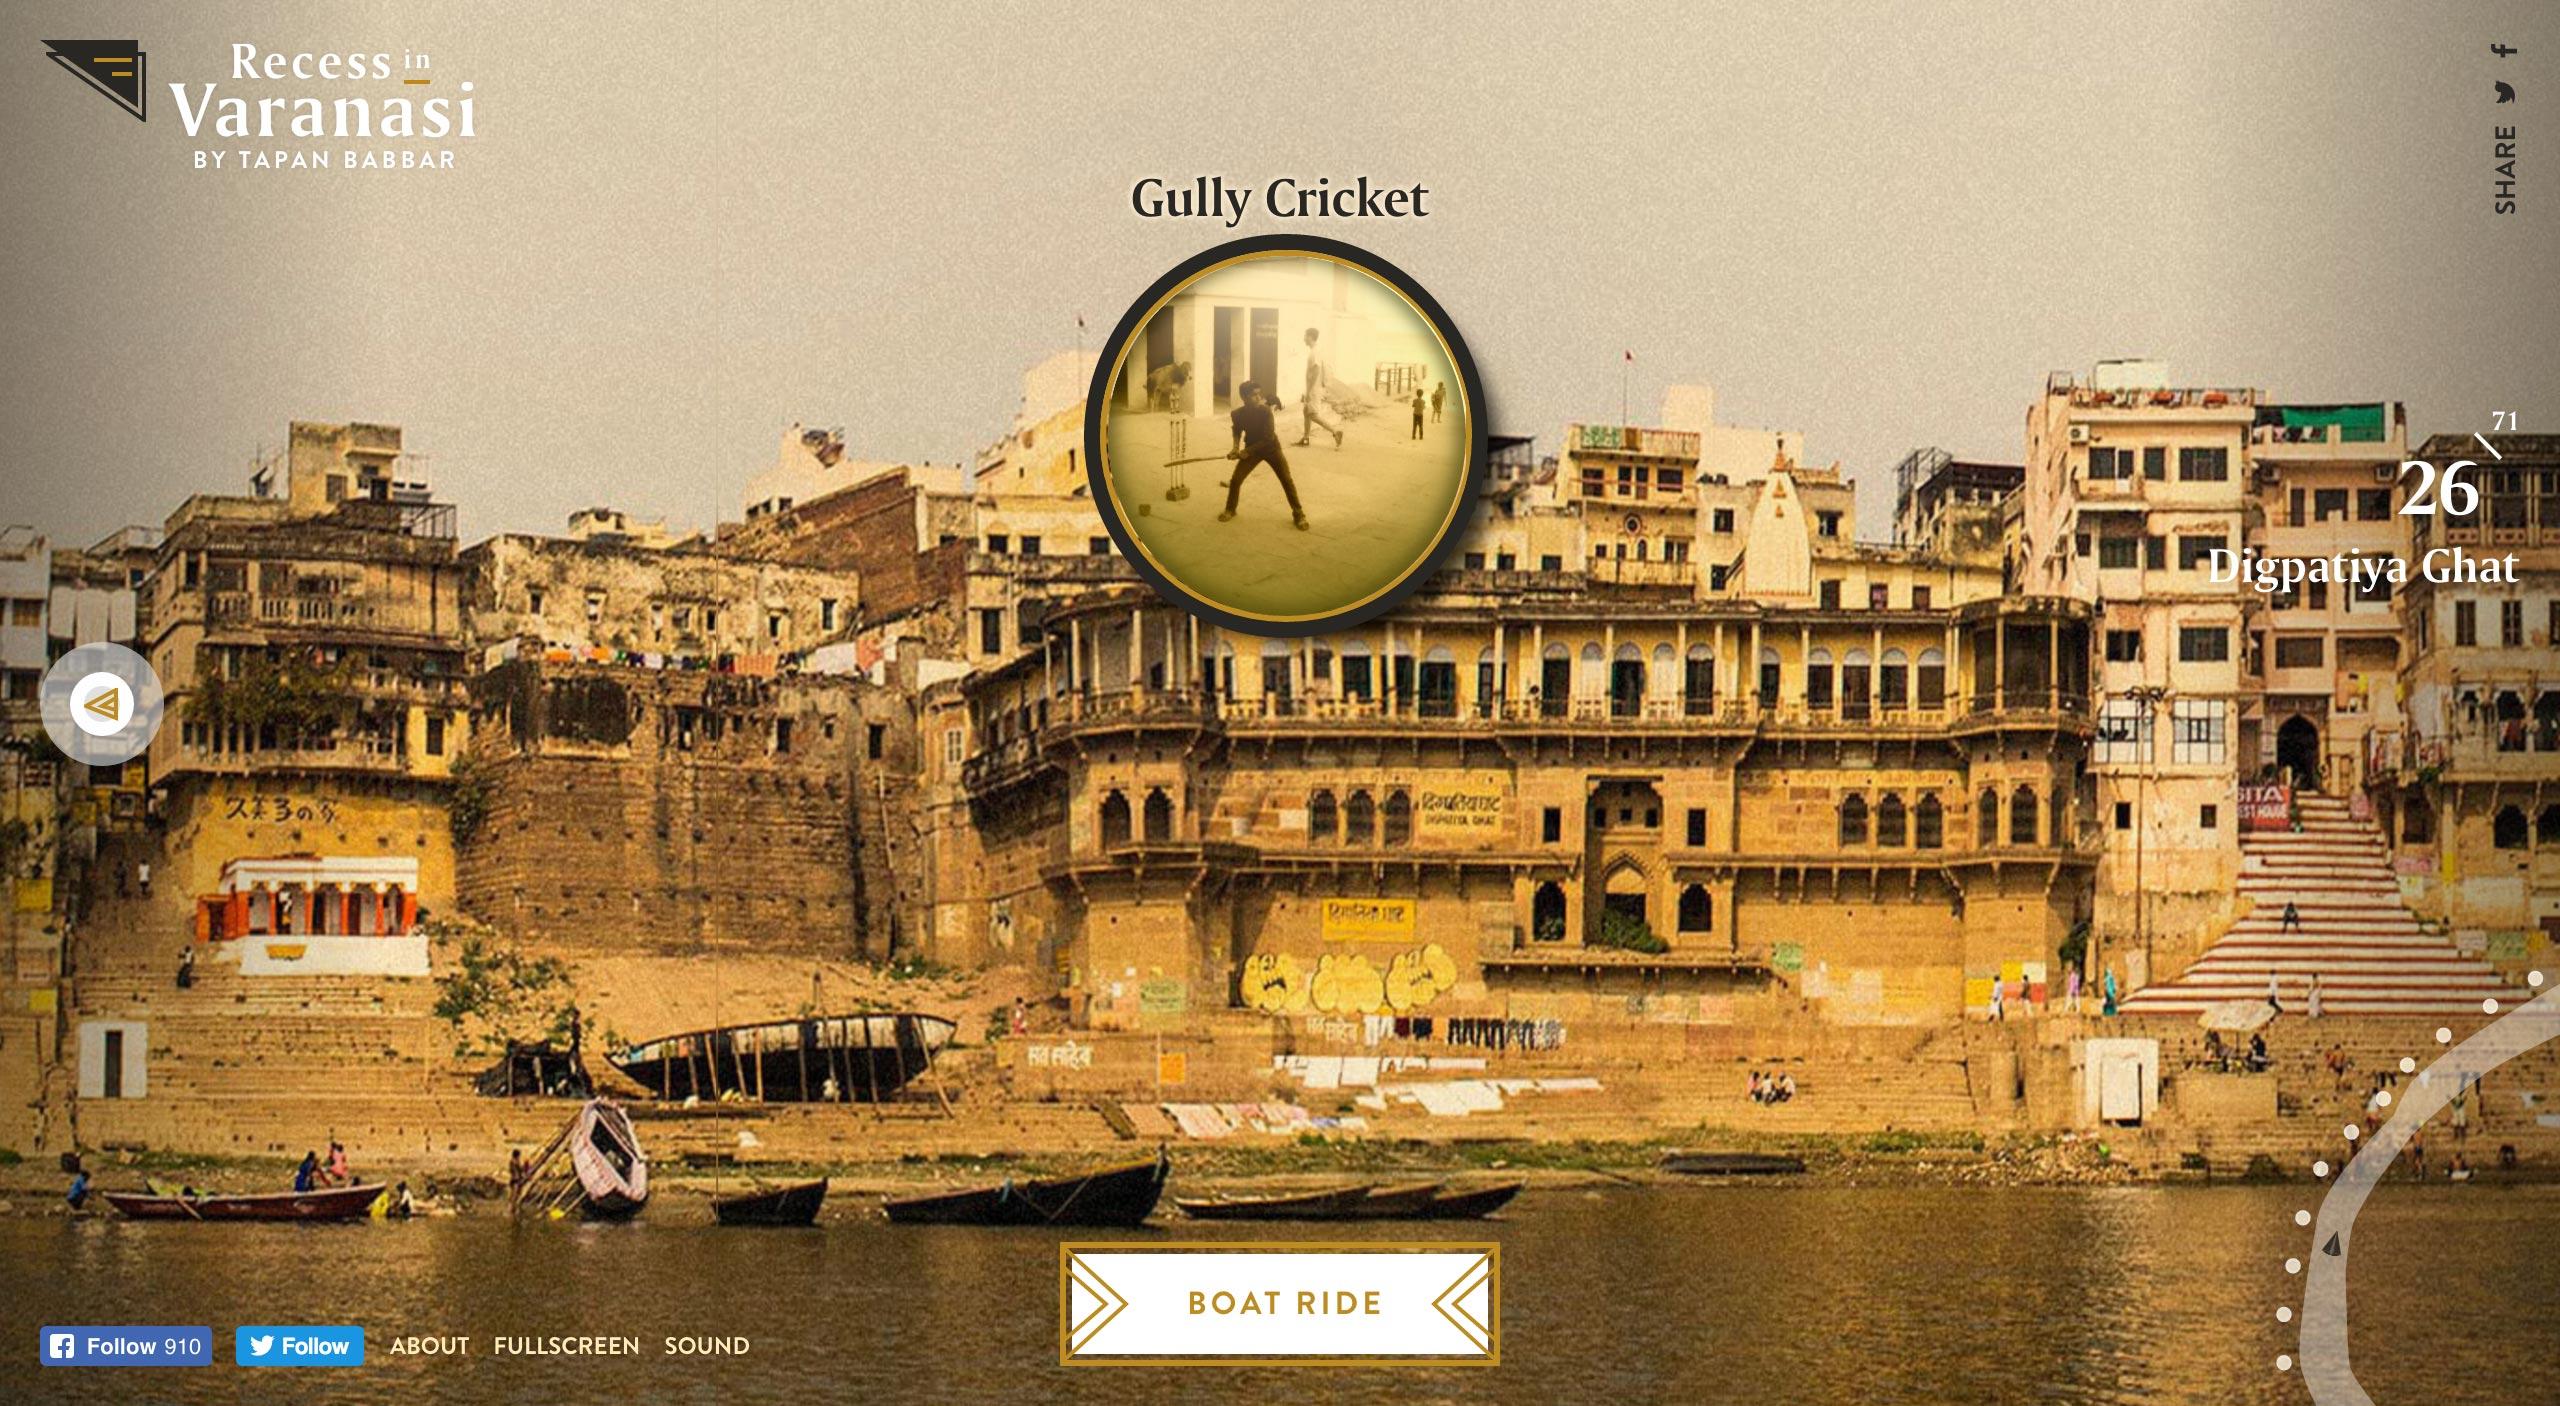 Recess in Varanasi Website Screenshot